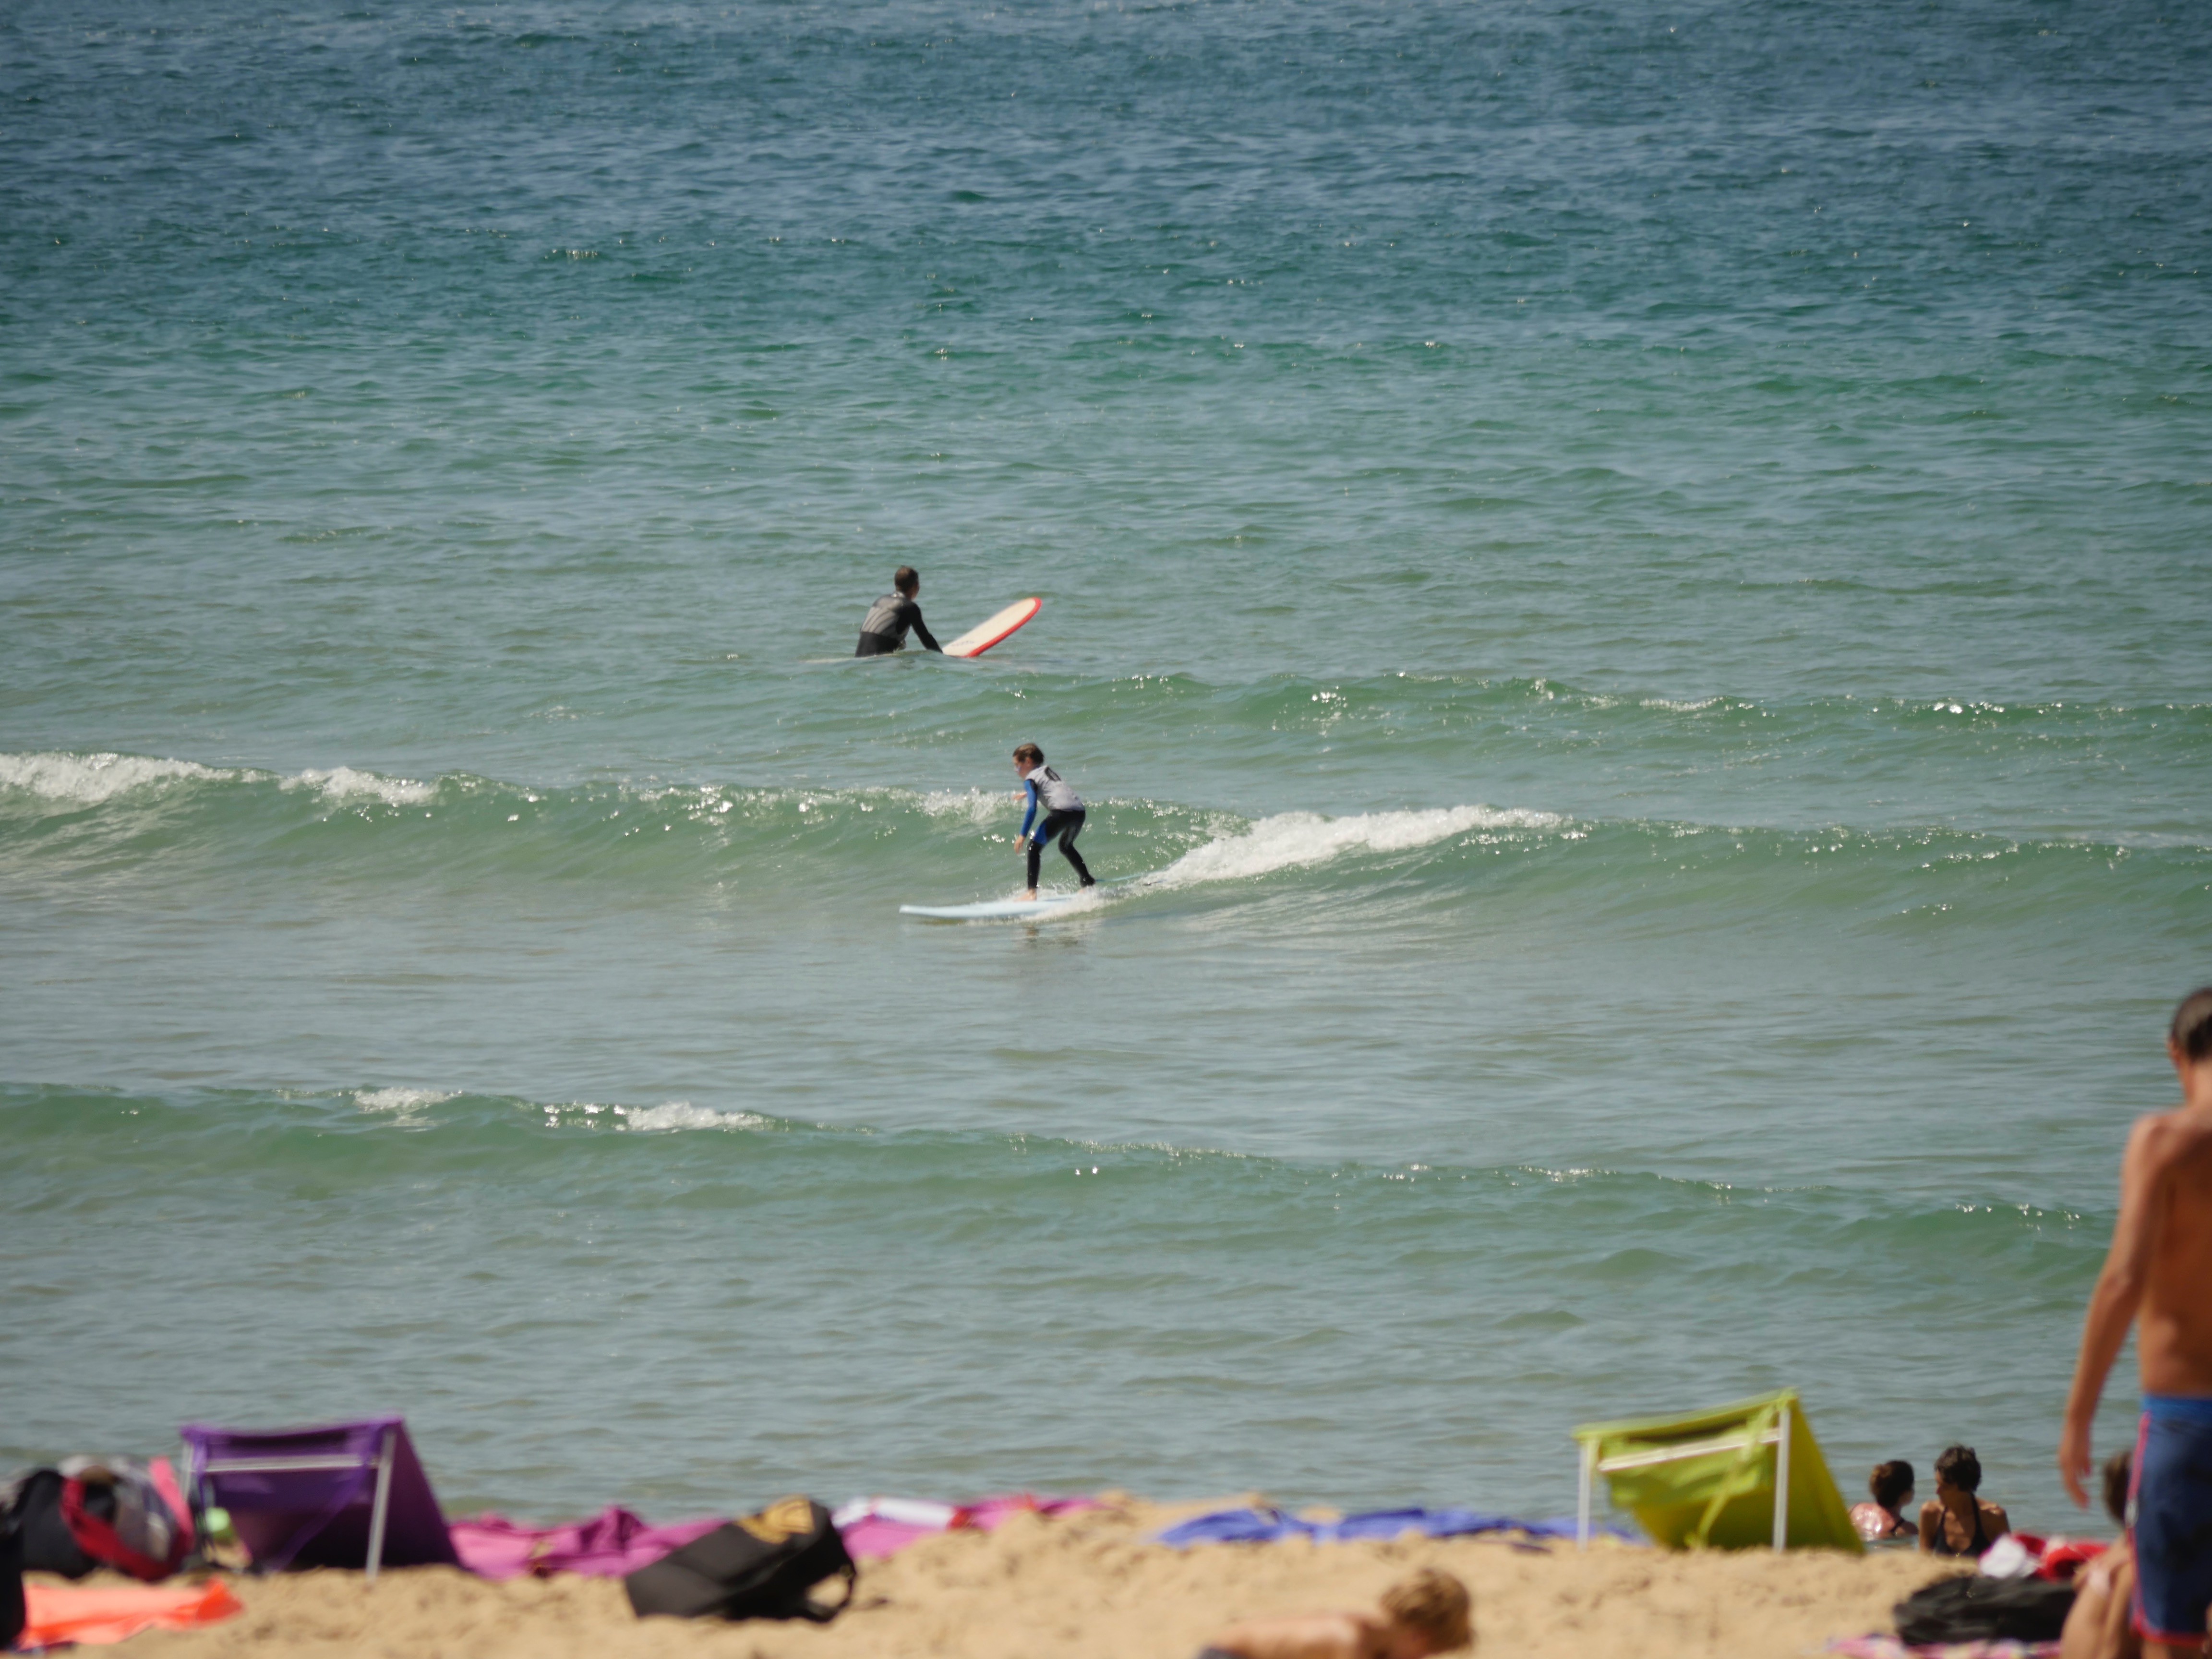 Chipiron Surfschool Hossegor